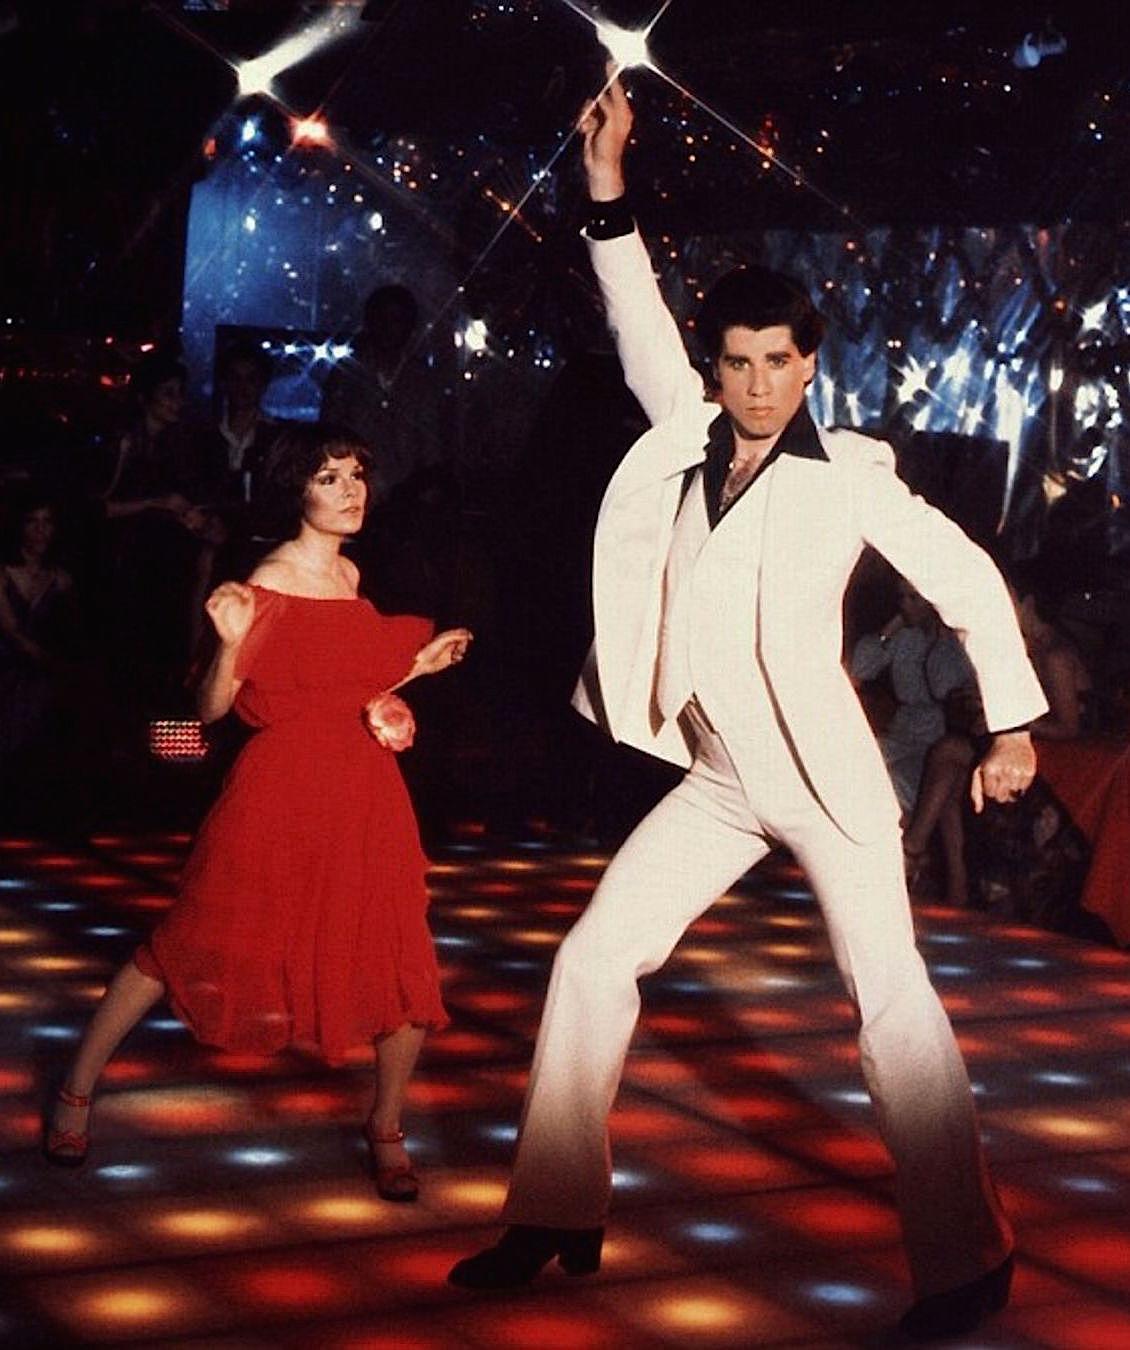 Men's Saturday Fever Travolta White Suit Costume Set 70s Disco Party Dancer